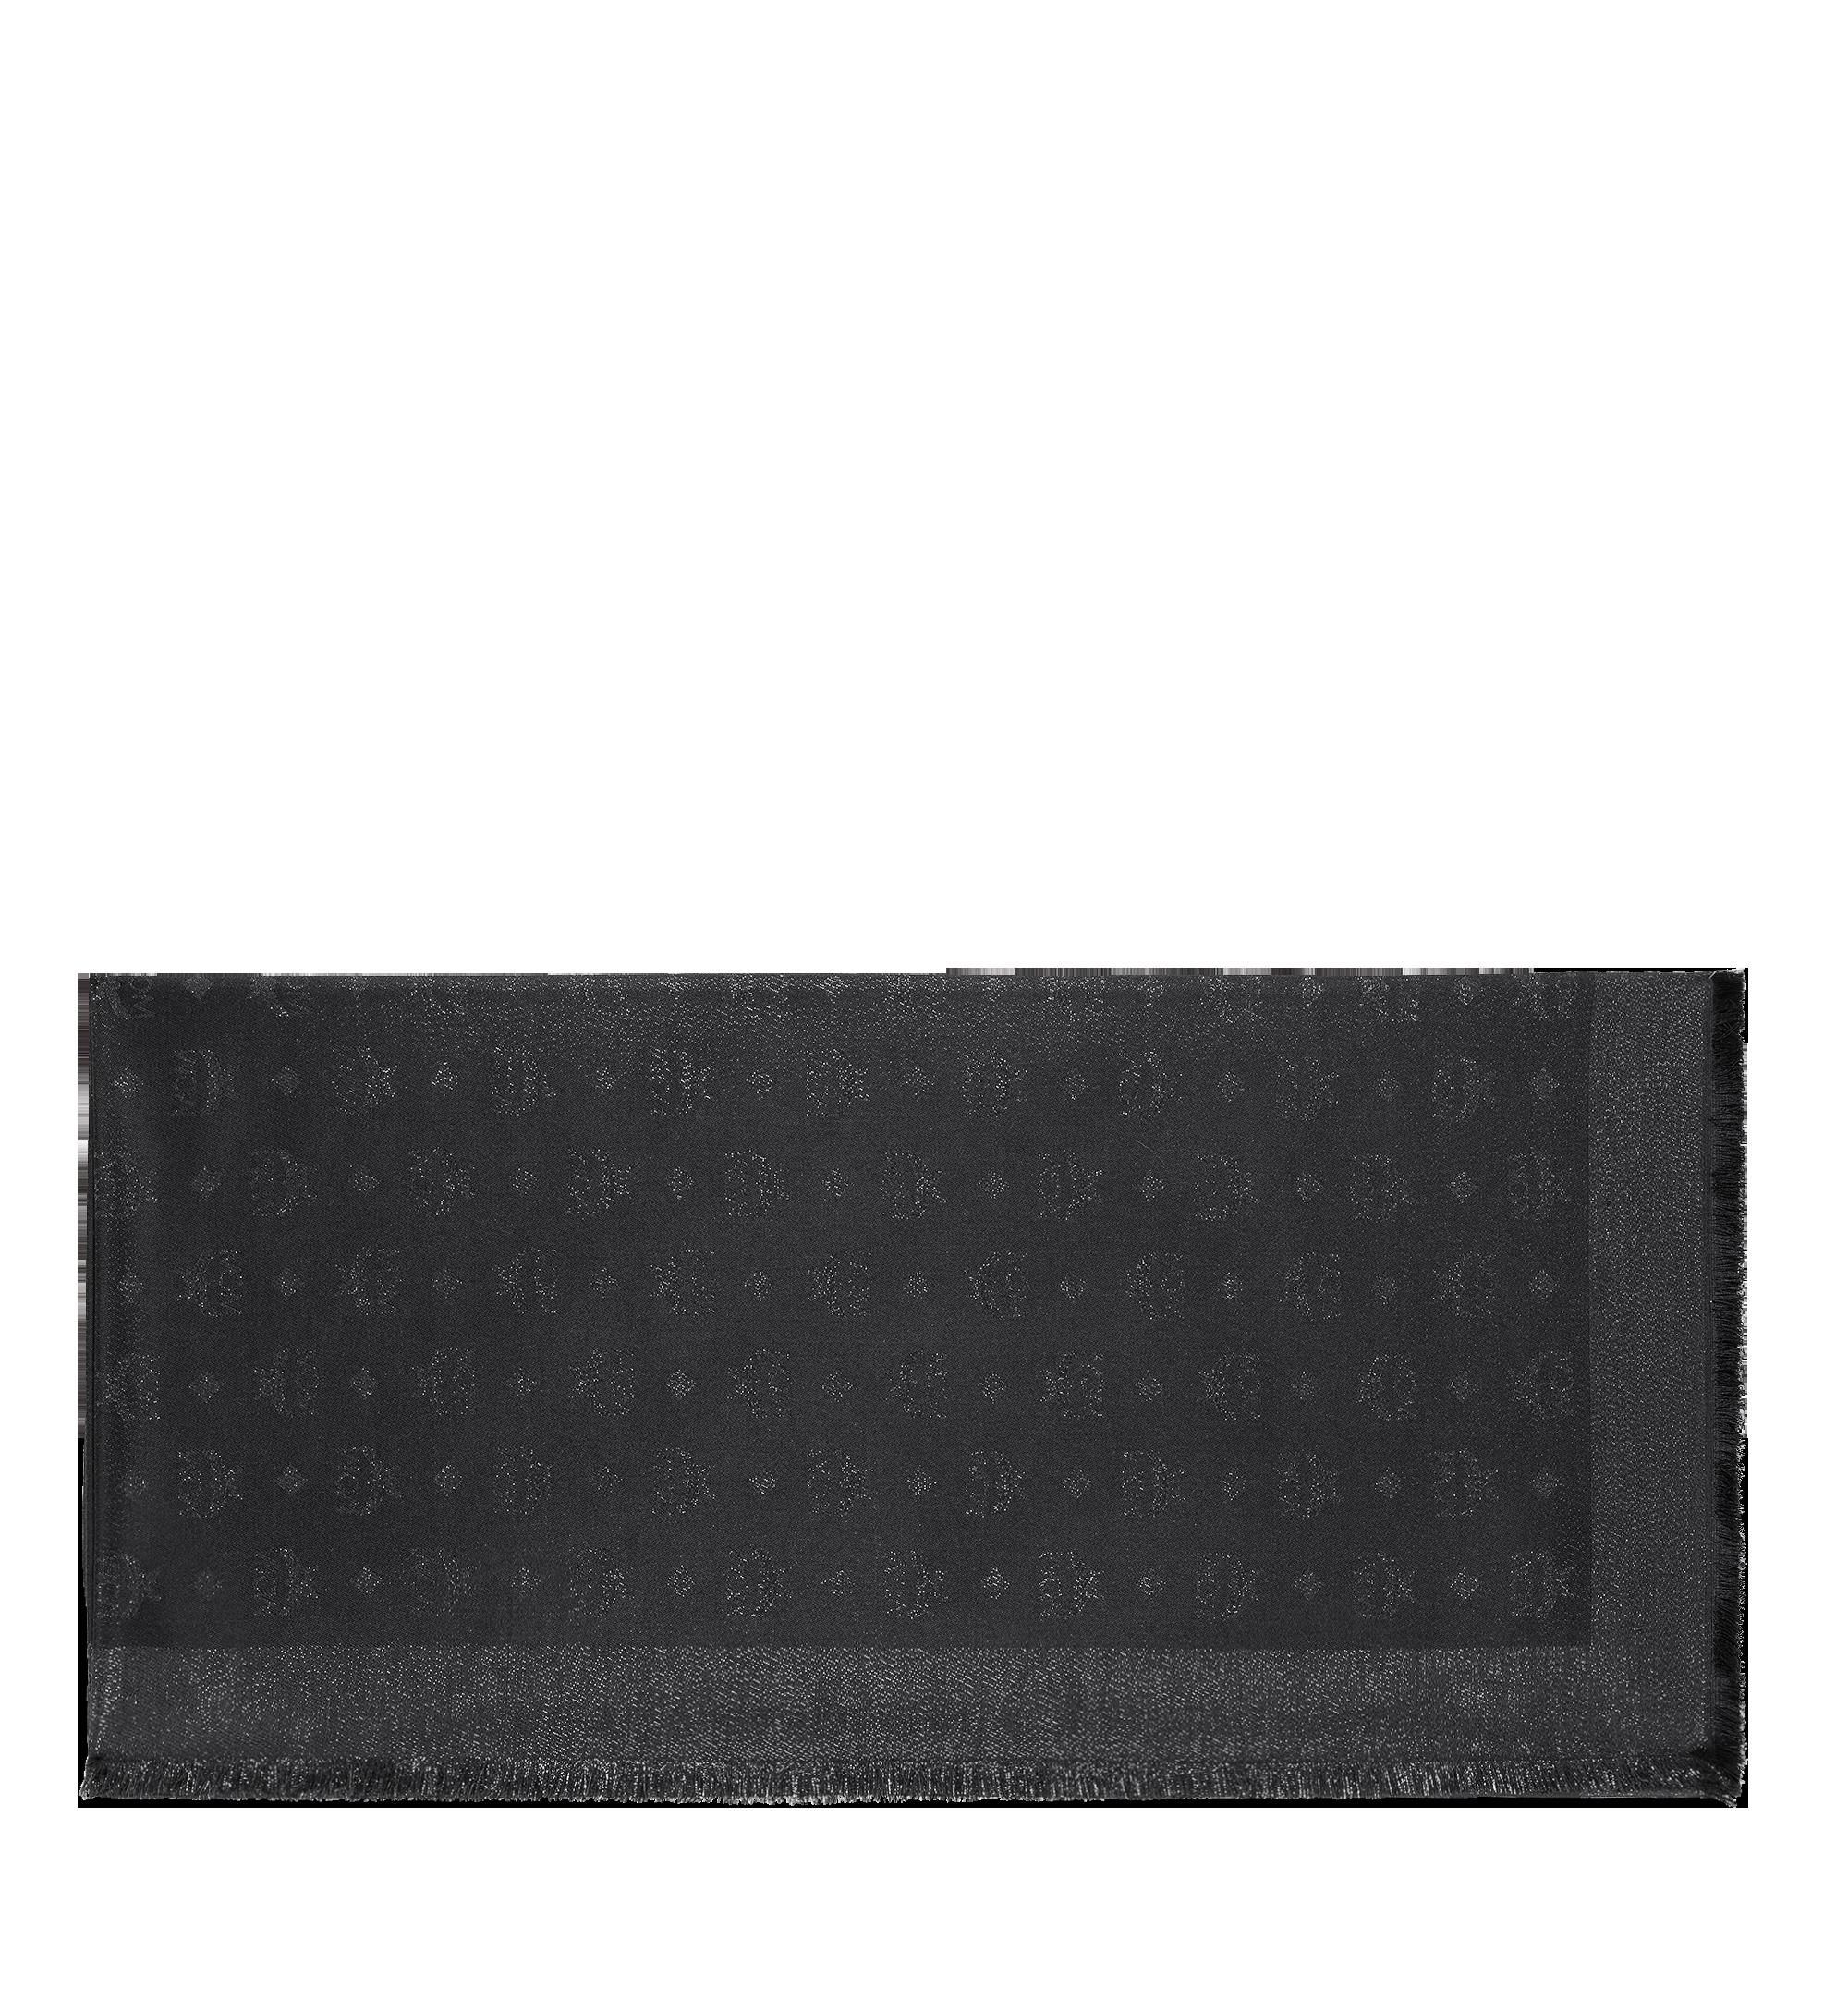 MCM 經典盧勒克絲金銀紗圍巾 Black MEF9SMM02BI001 更多視圖 1